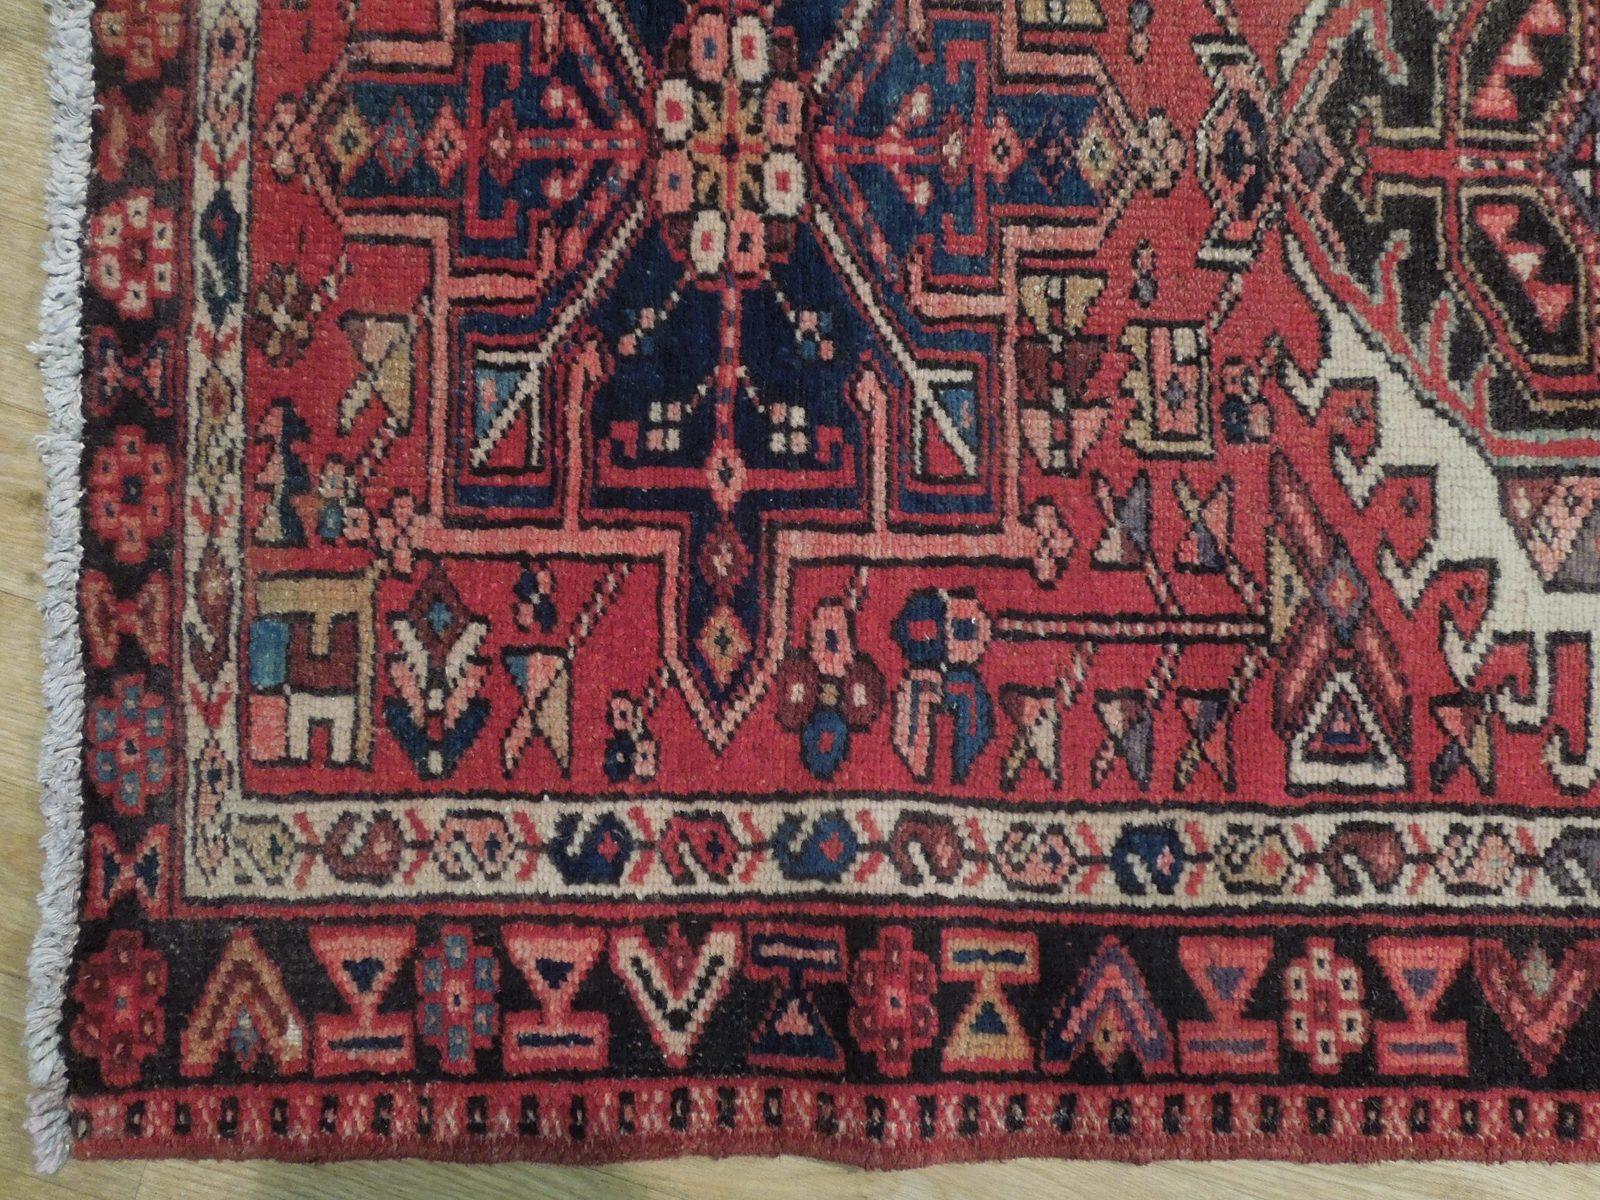 Red 3 x 13 All-Over Classic Tribal Design Runner Karaja Persian Handmade Rug image 7